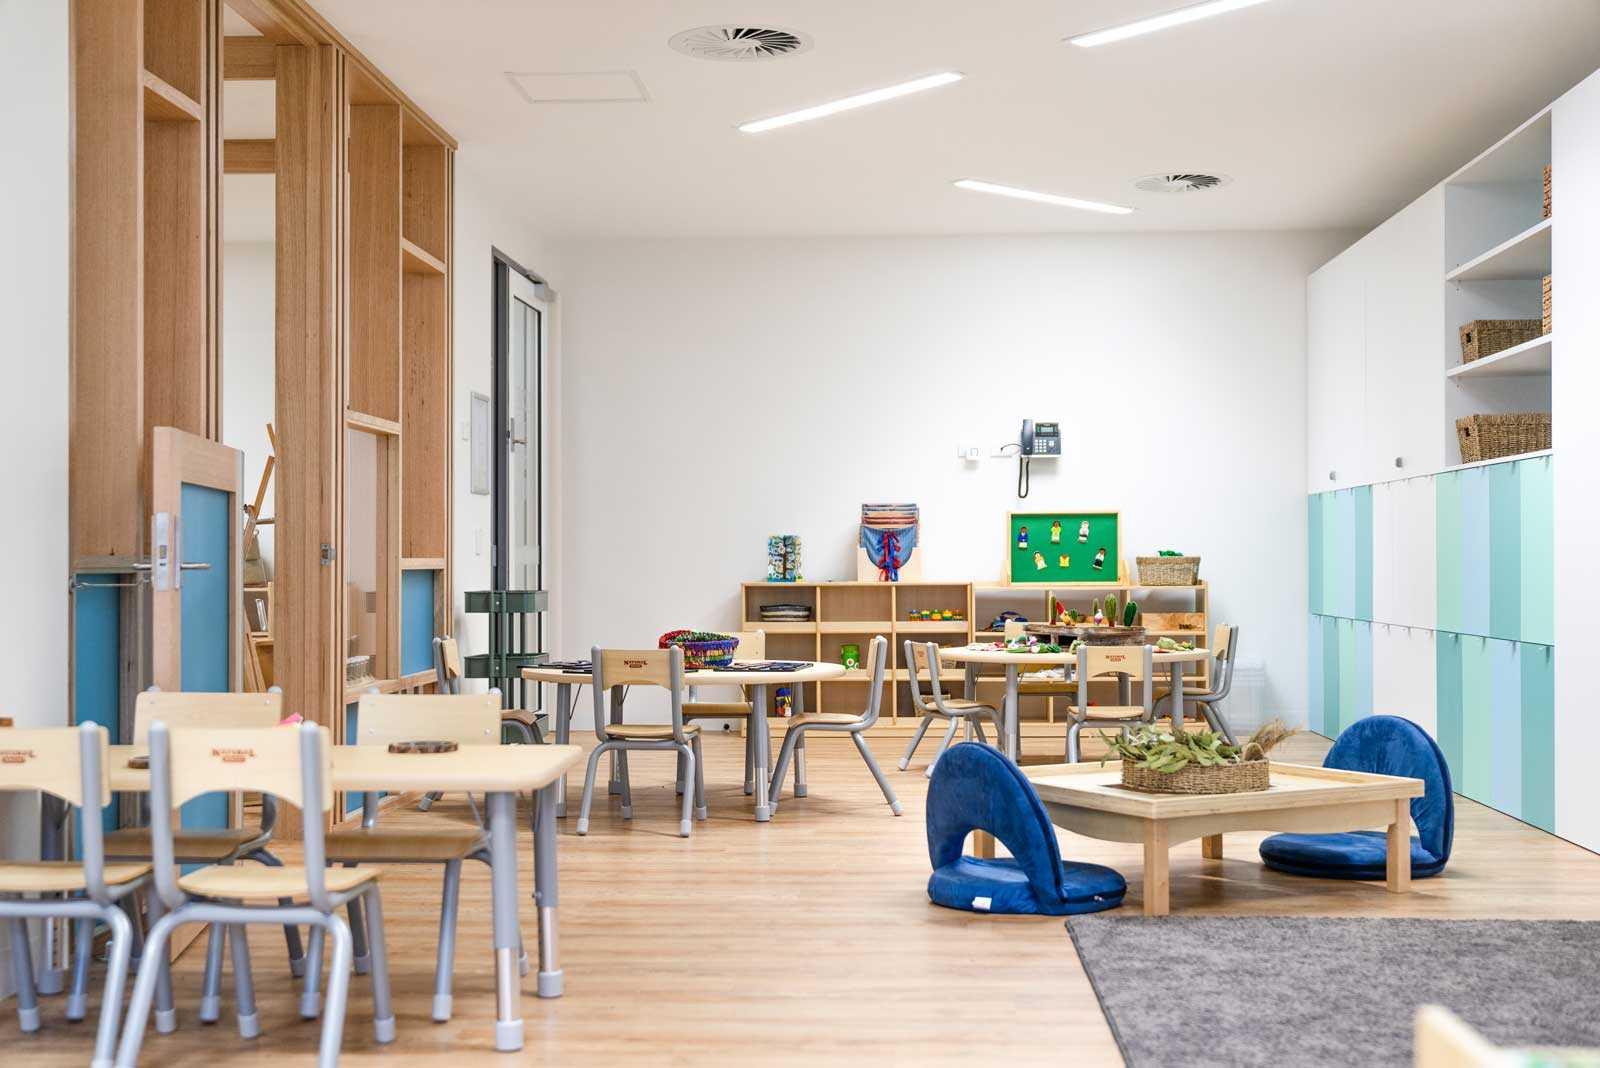 Belair Childcare Centre